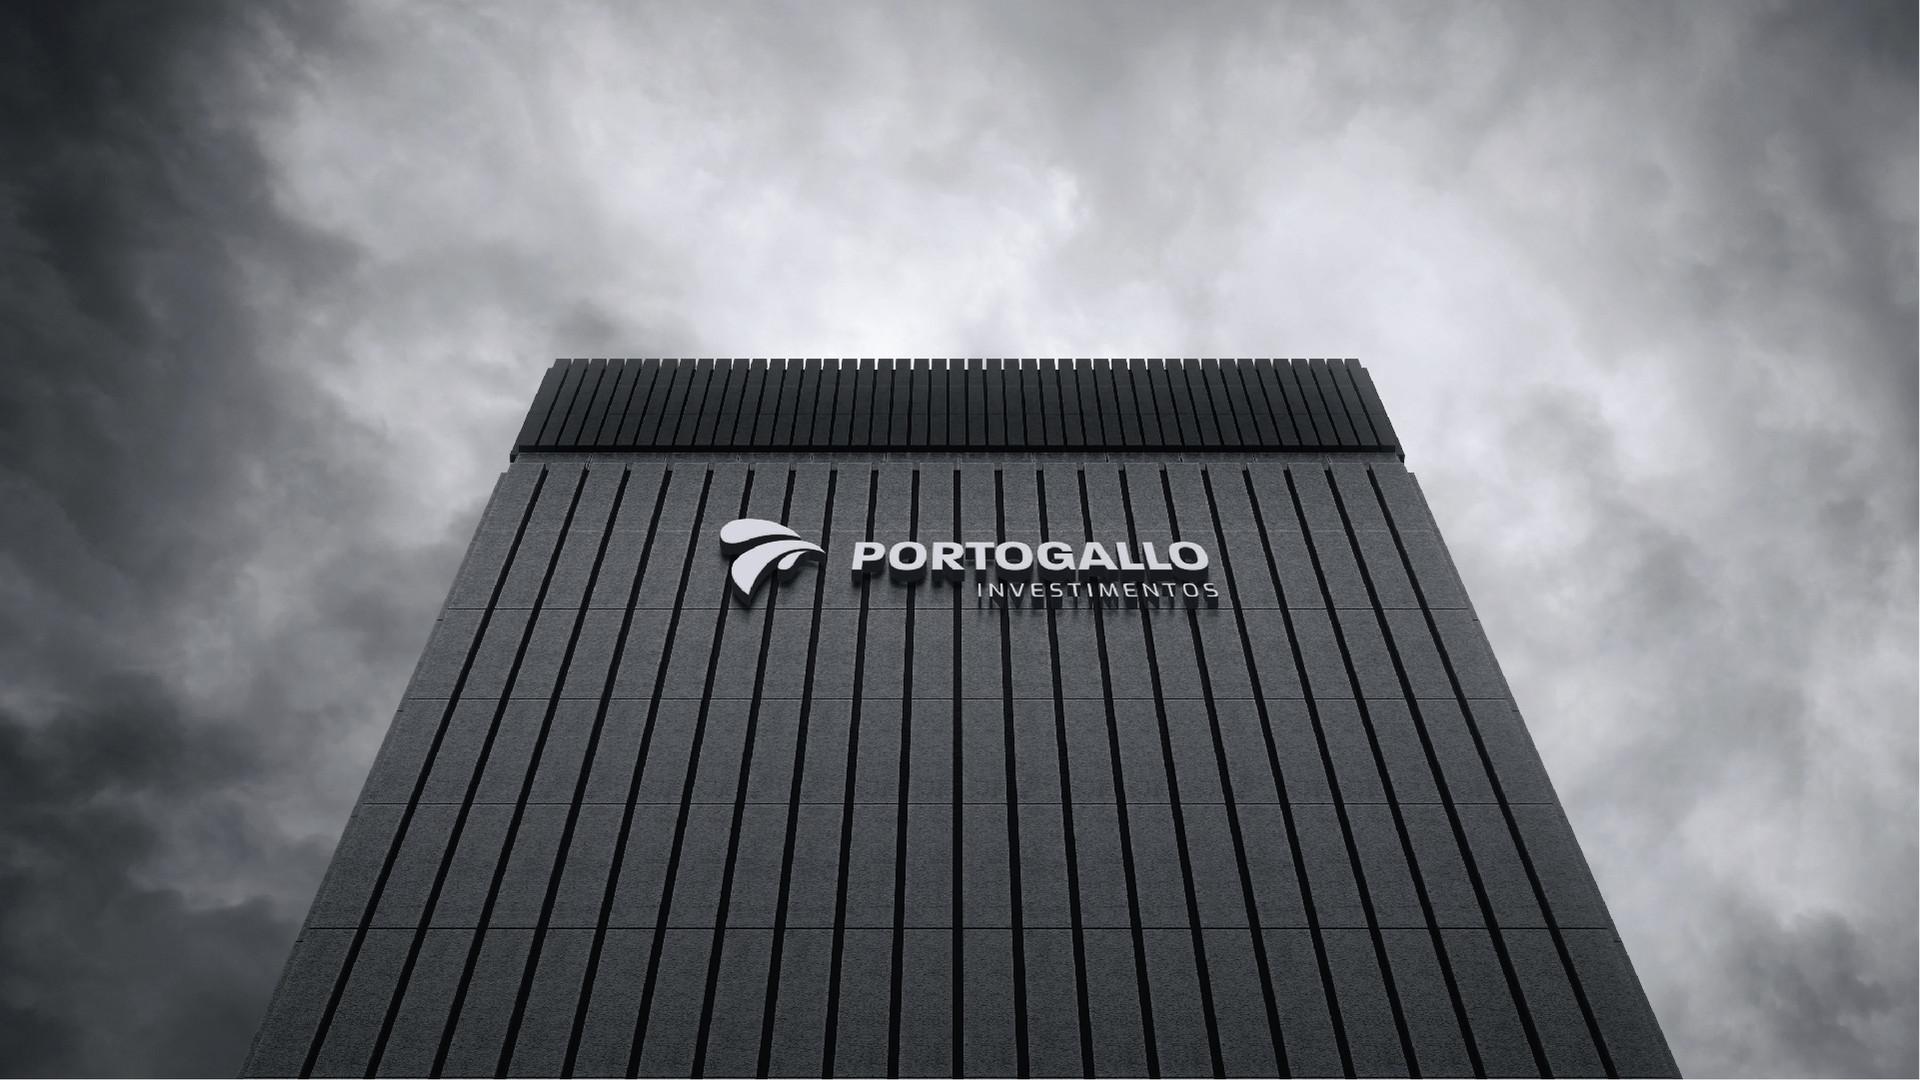 img-portfolio-portogallo-voadora (8).jpg